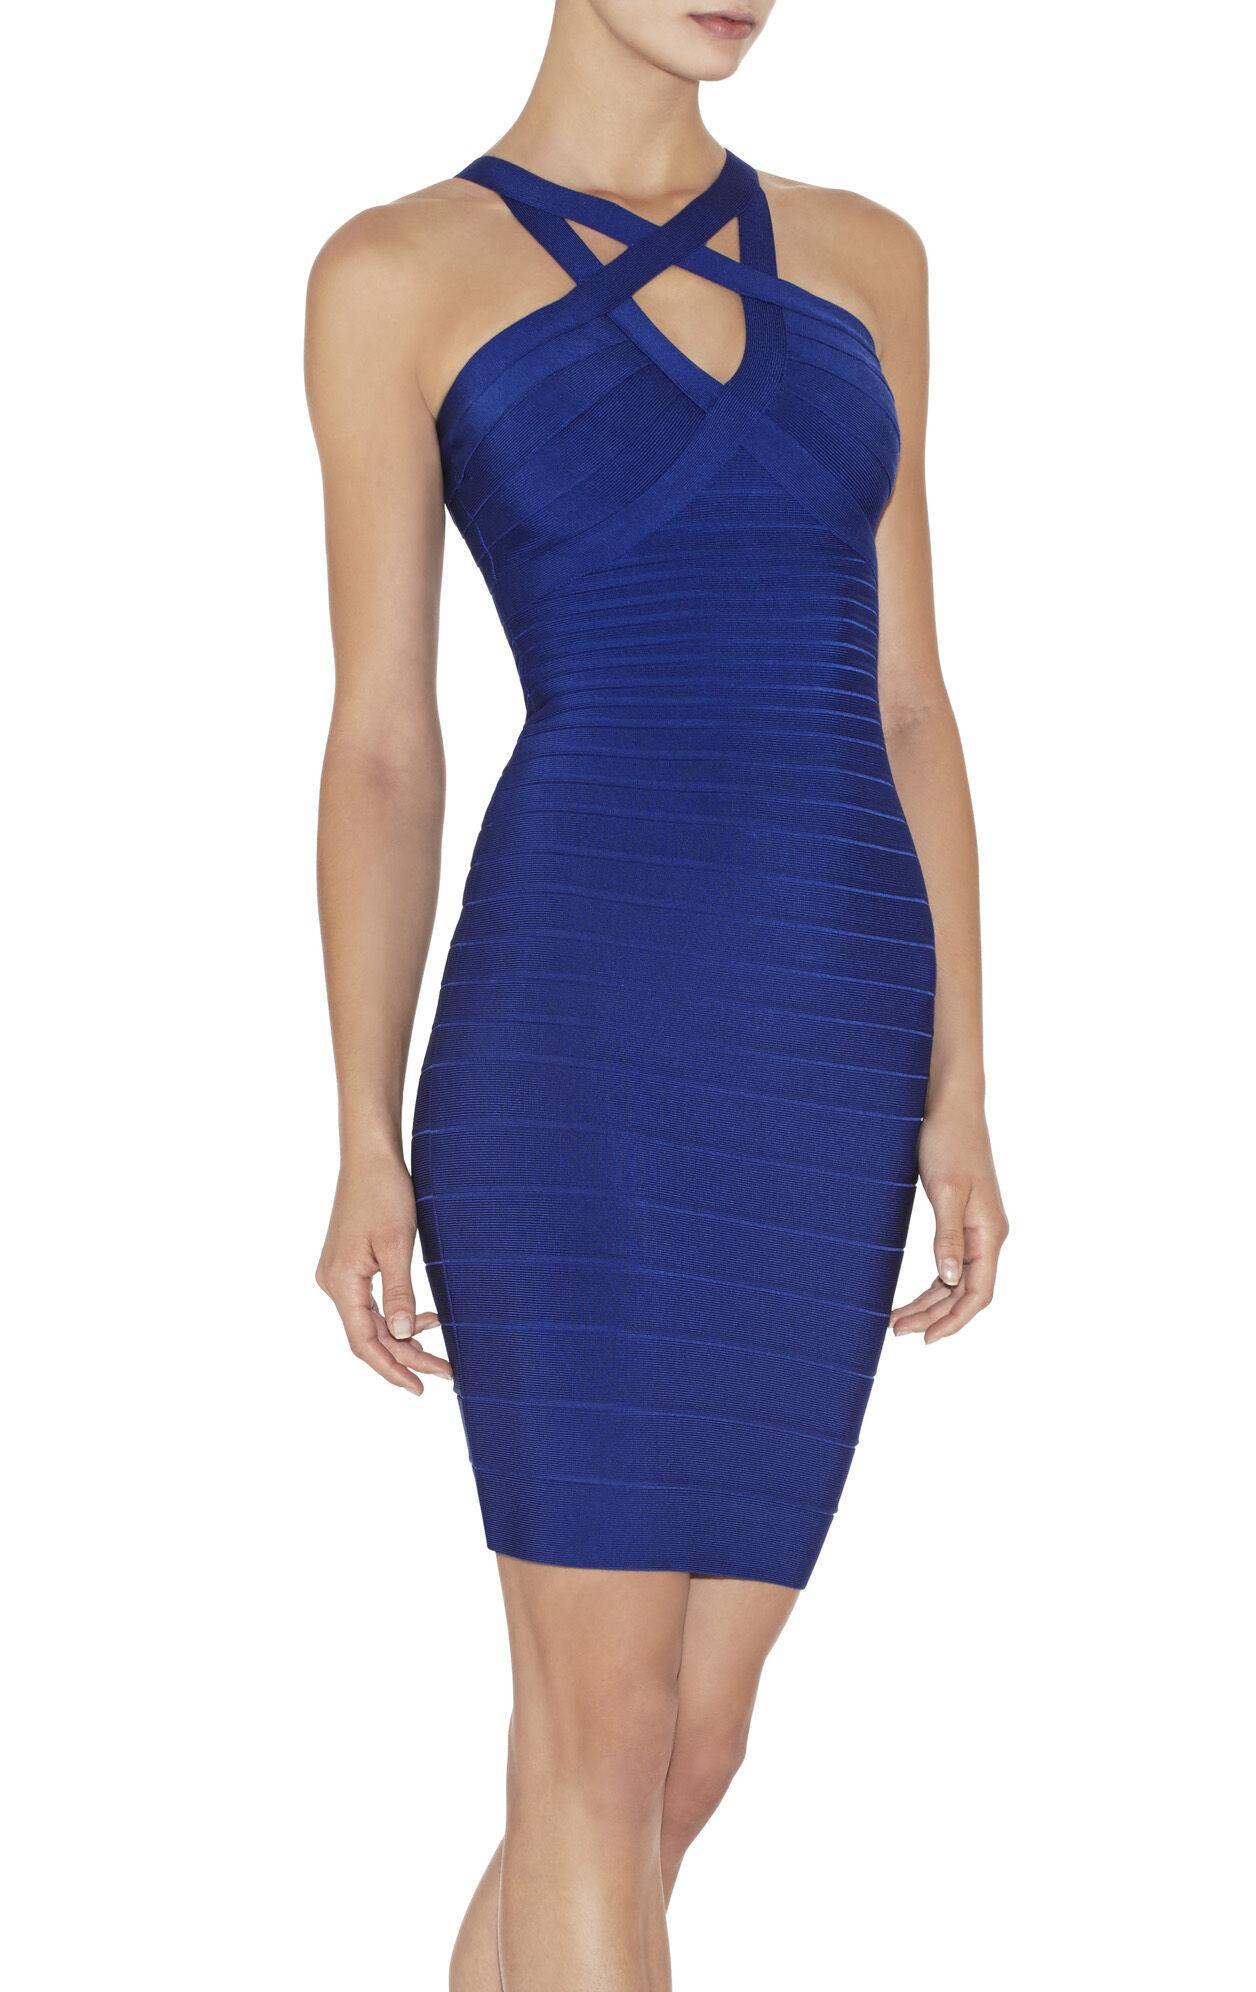 Myra Signature Sleeveless Dress